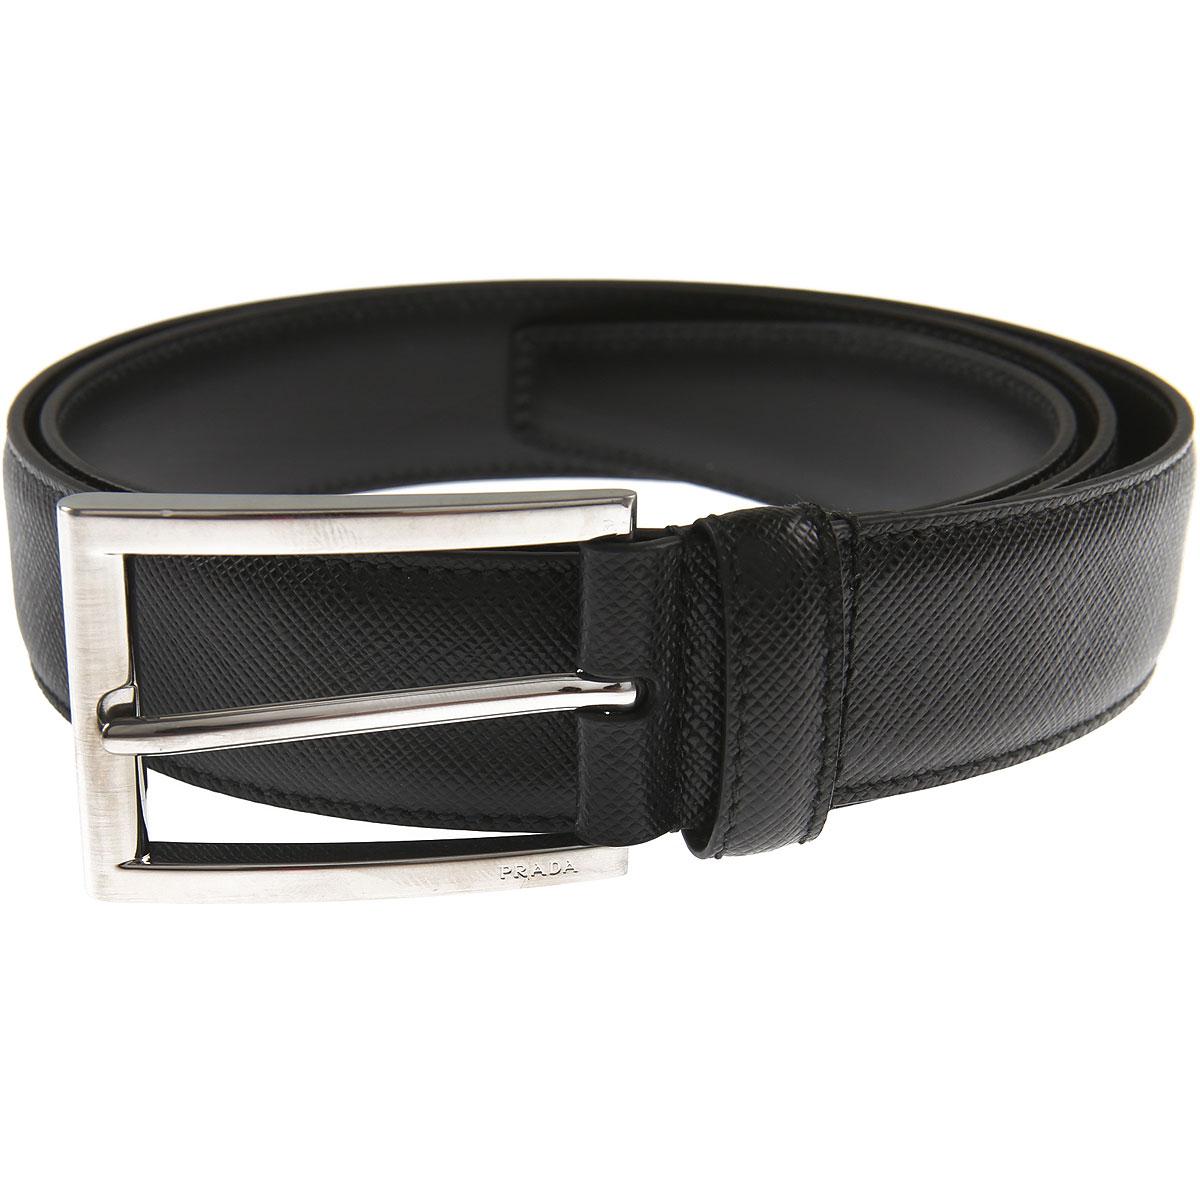 Prada Belts On Sale, Black, Leather, 2019, 40 42